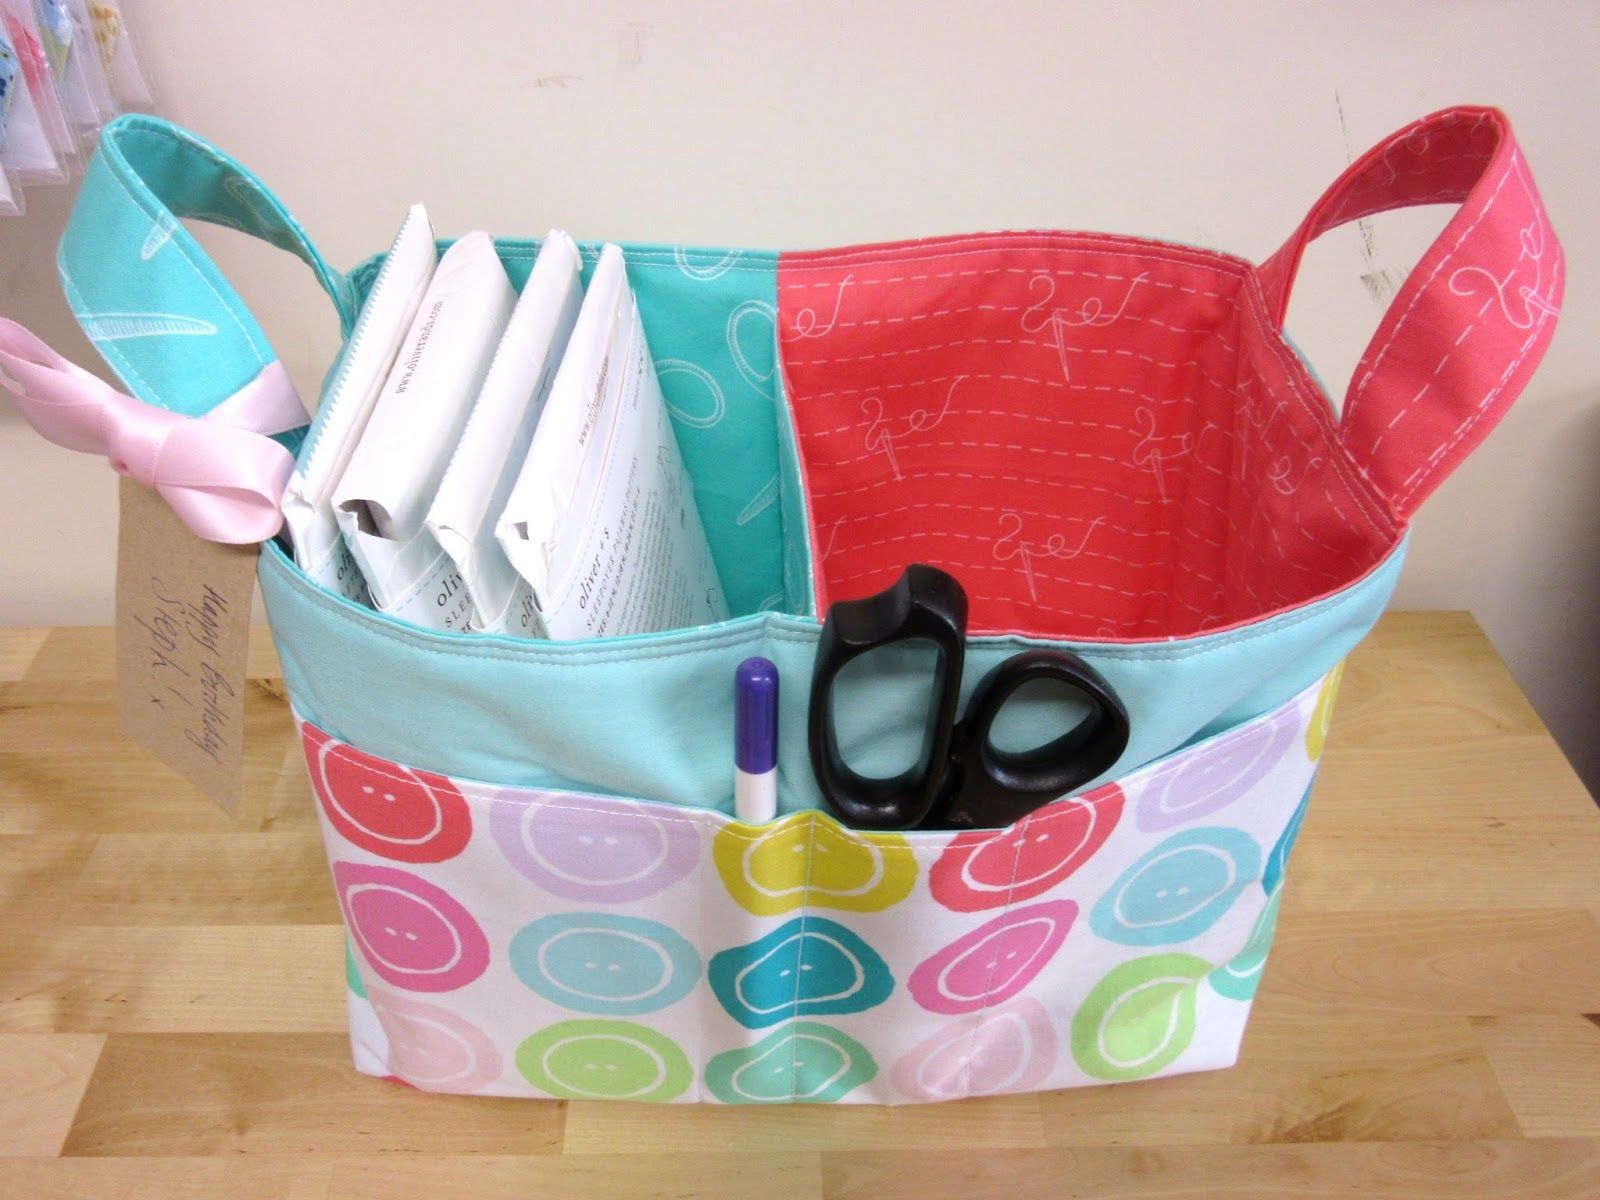 Enchanting Fabric Shower Caddy Crest - Luxurious Bathtub Ideas and ...